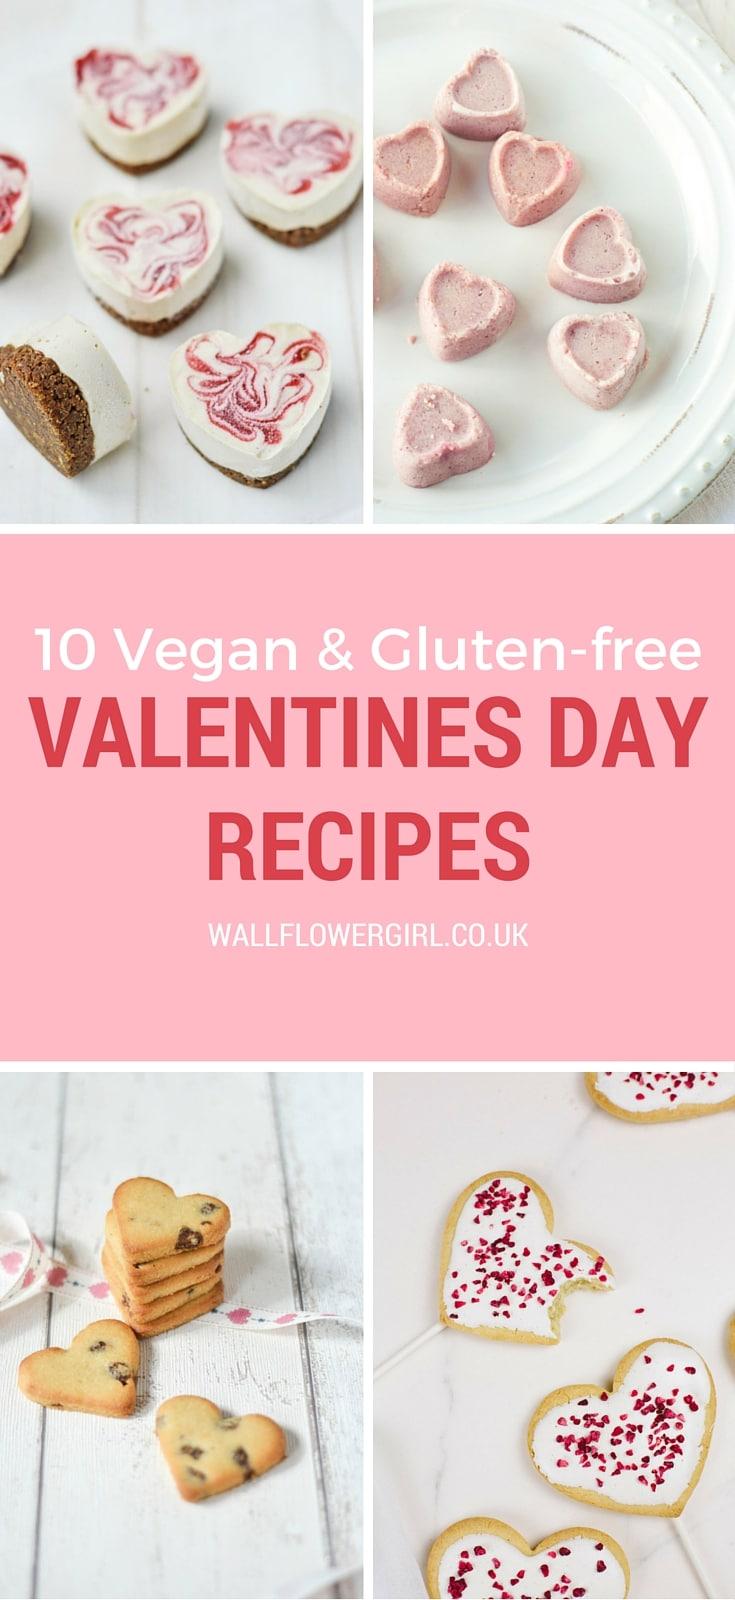 10 Vegan & Gluten-free Valentines Treats